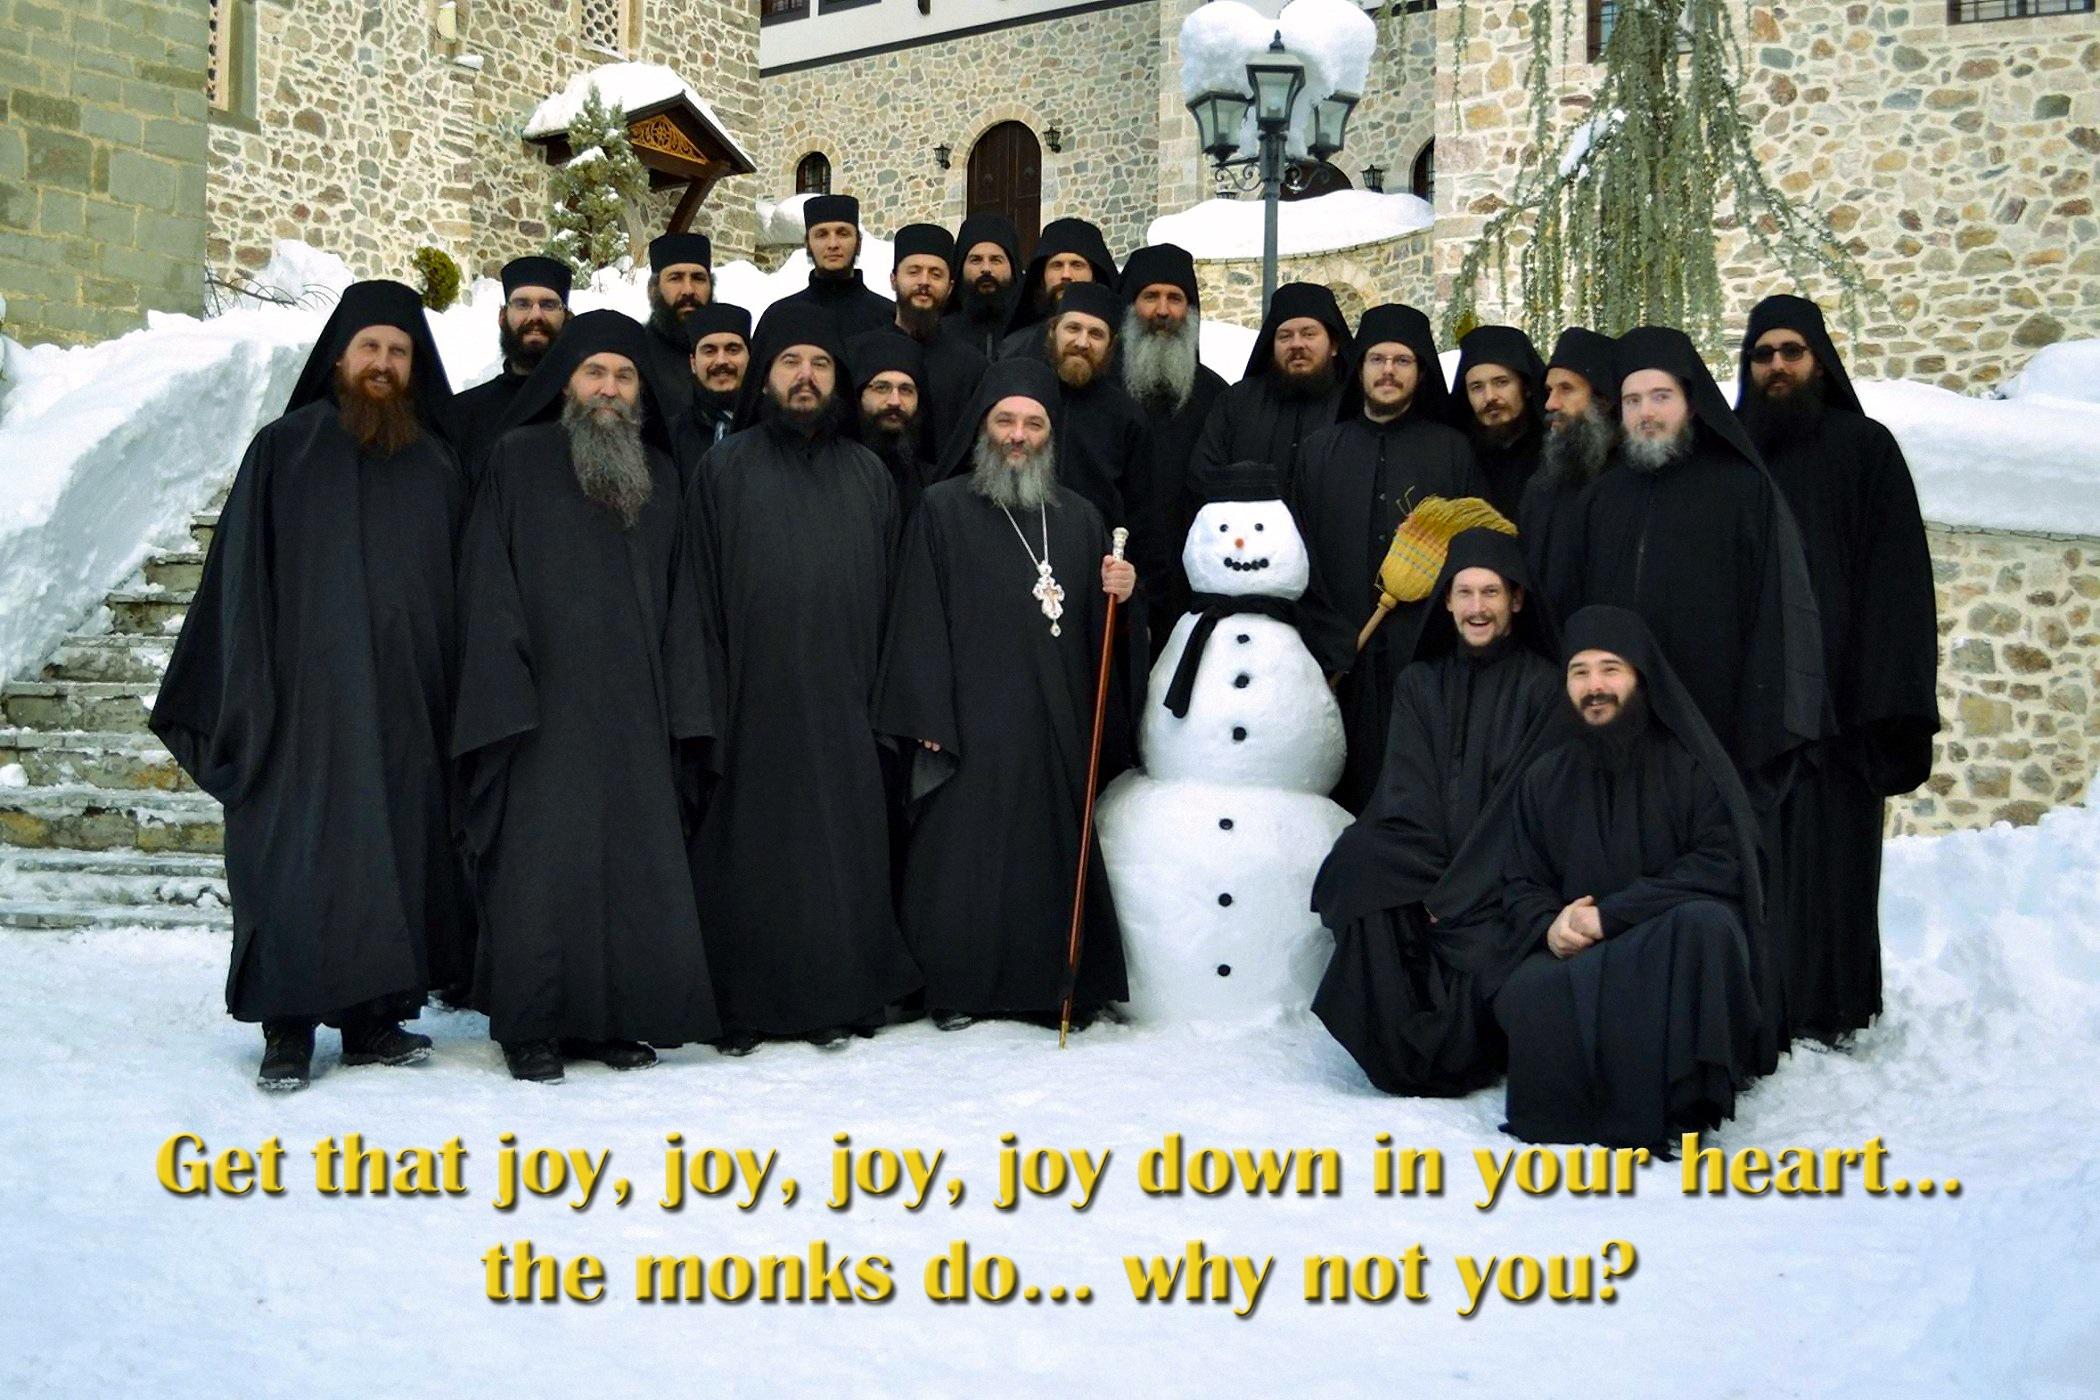 00 smiling monks 291115